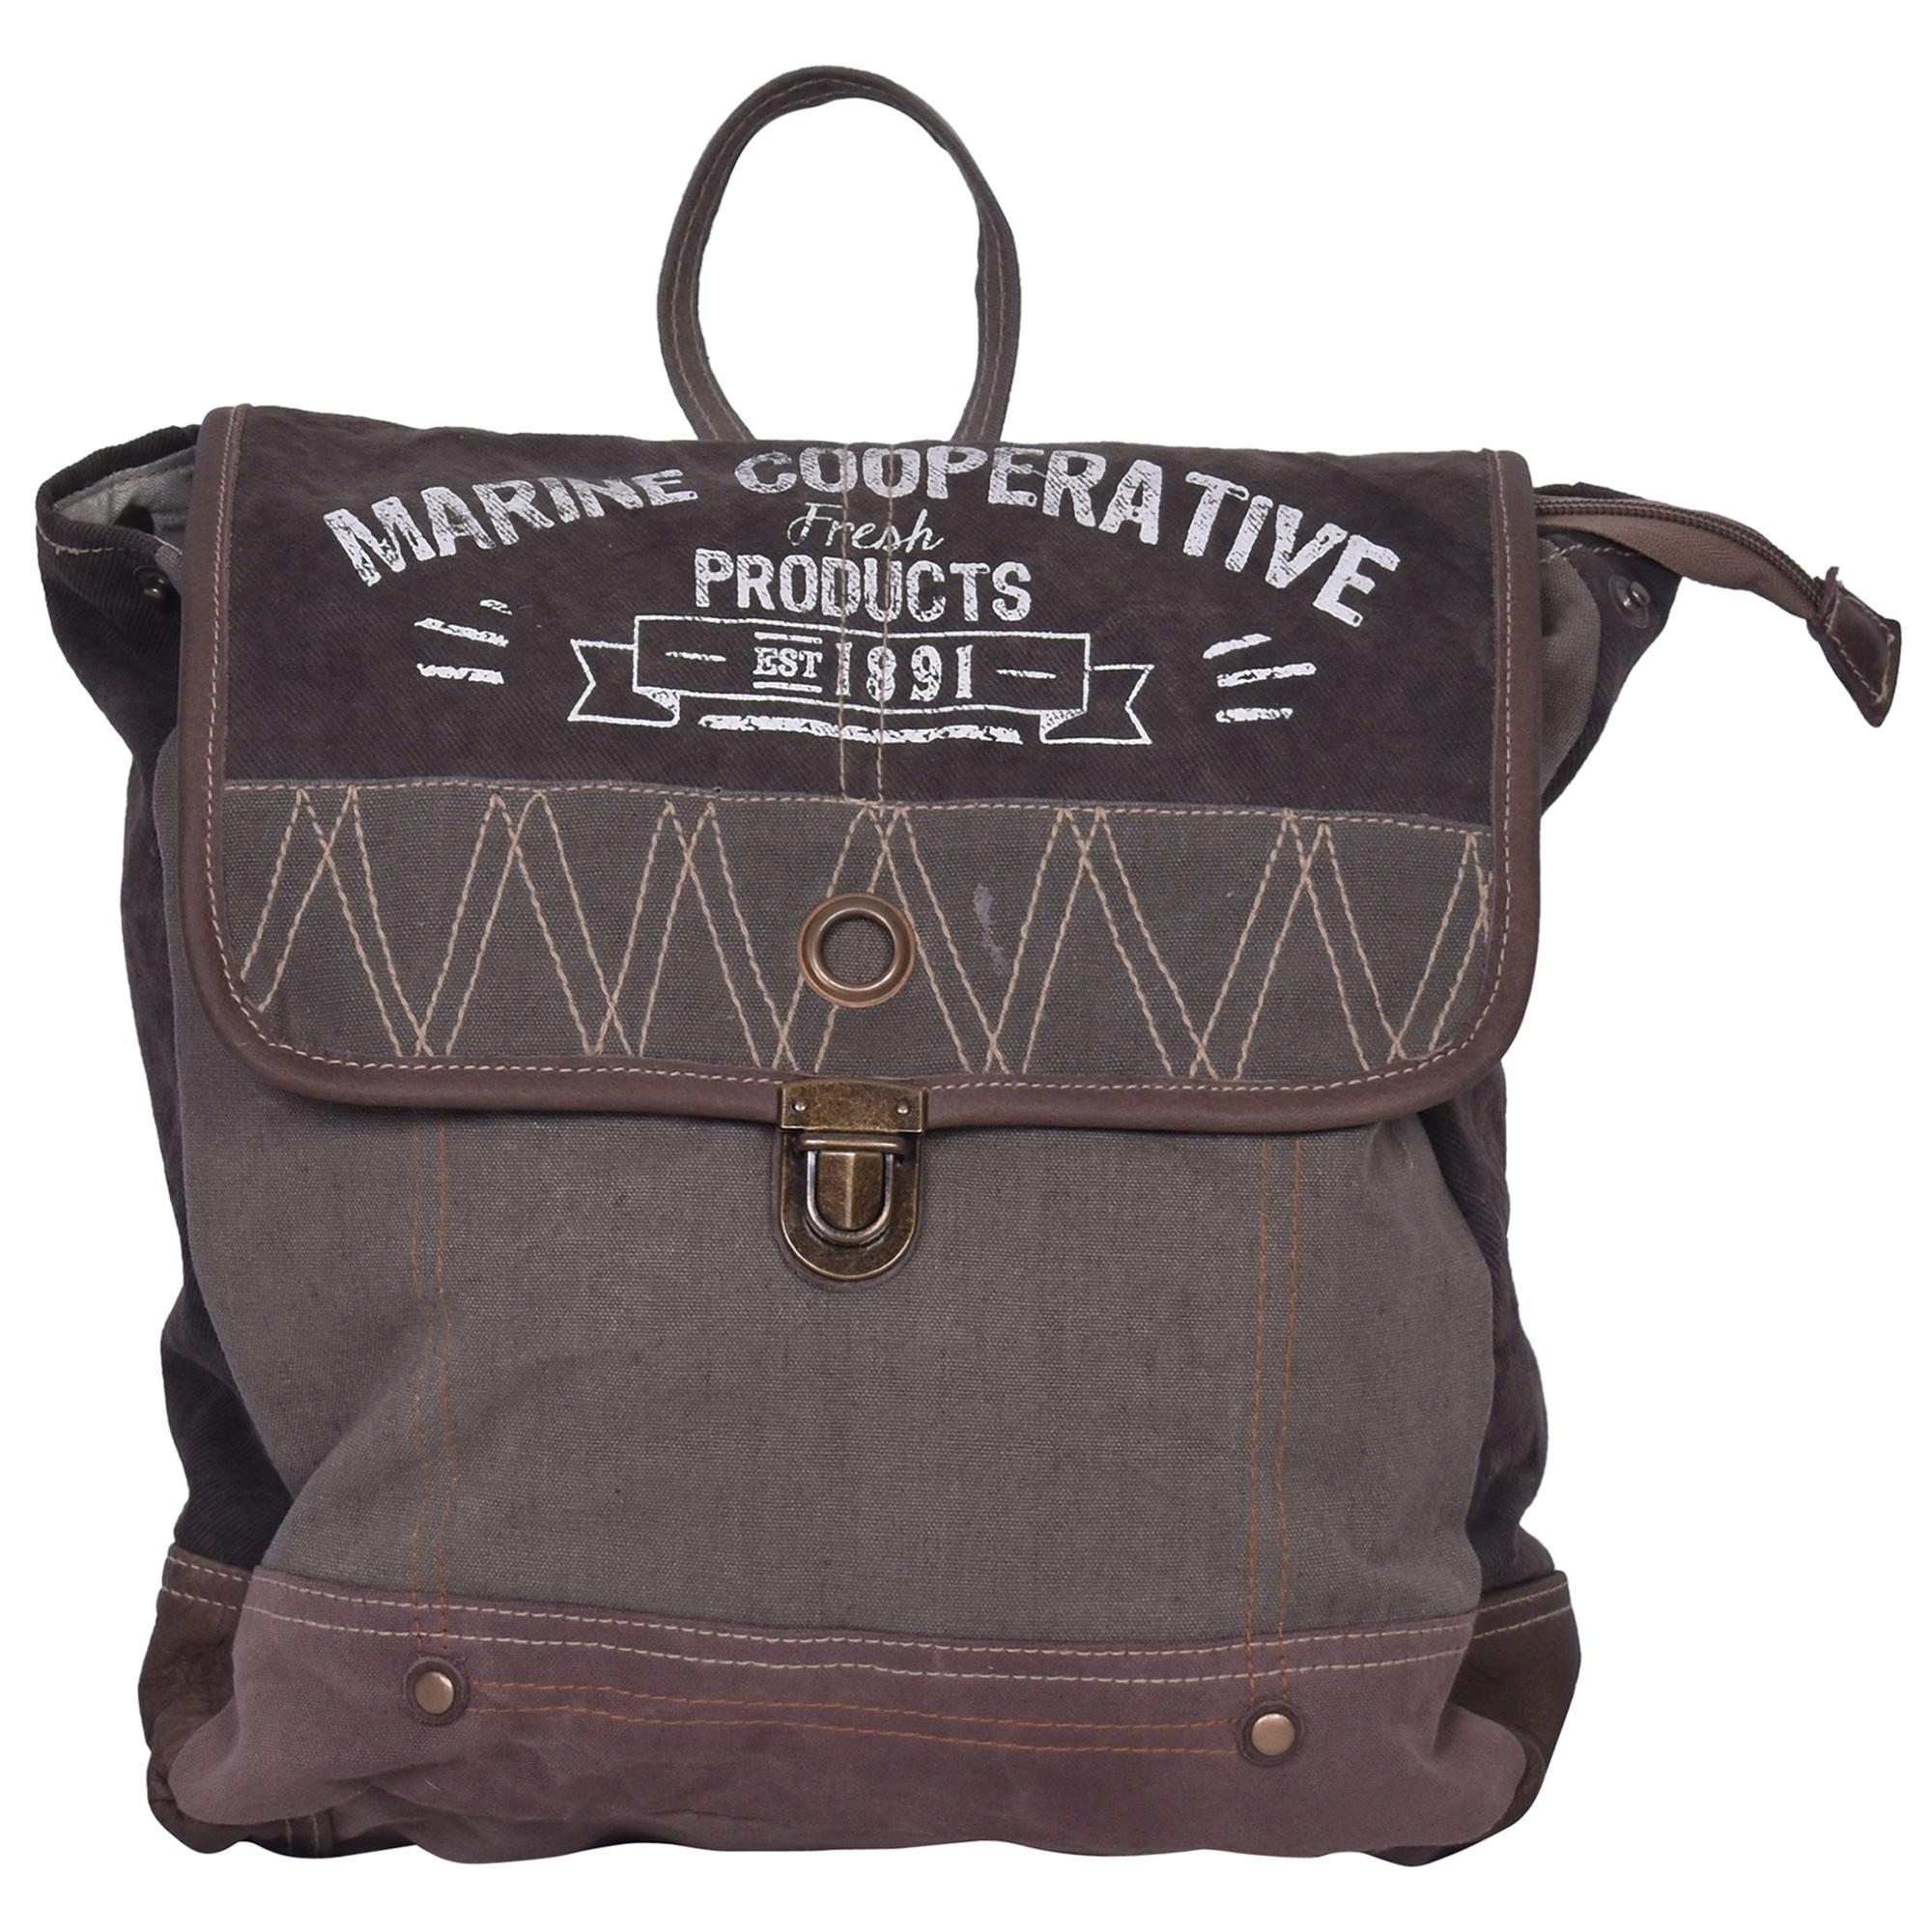 M.C Cotton Canvas Backpack Bag